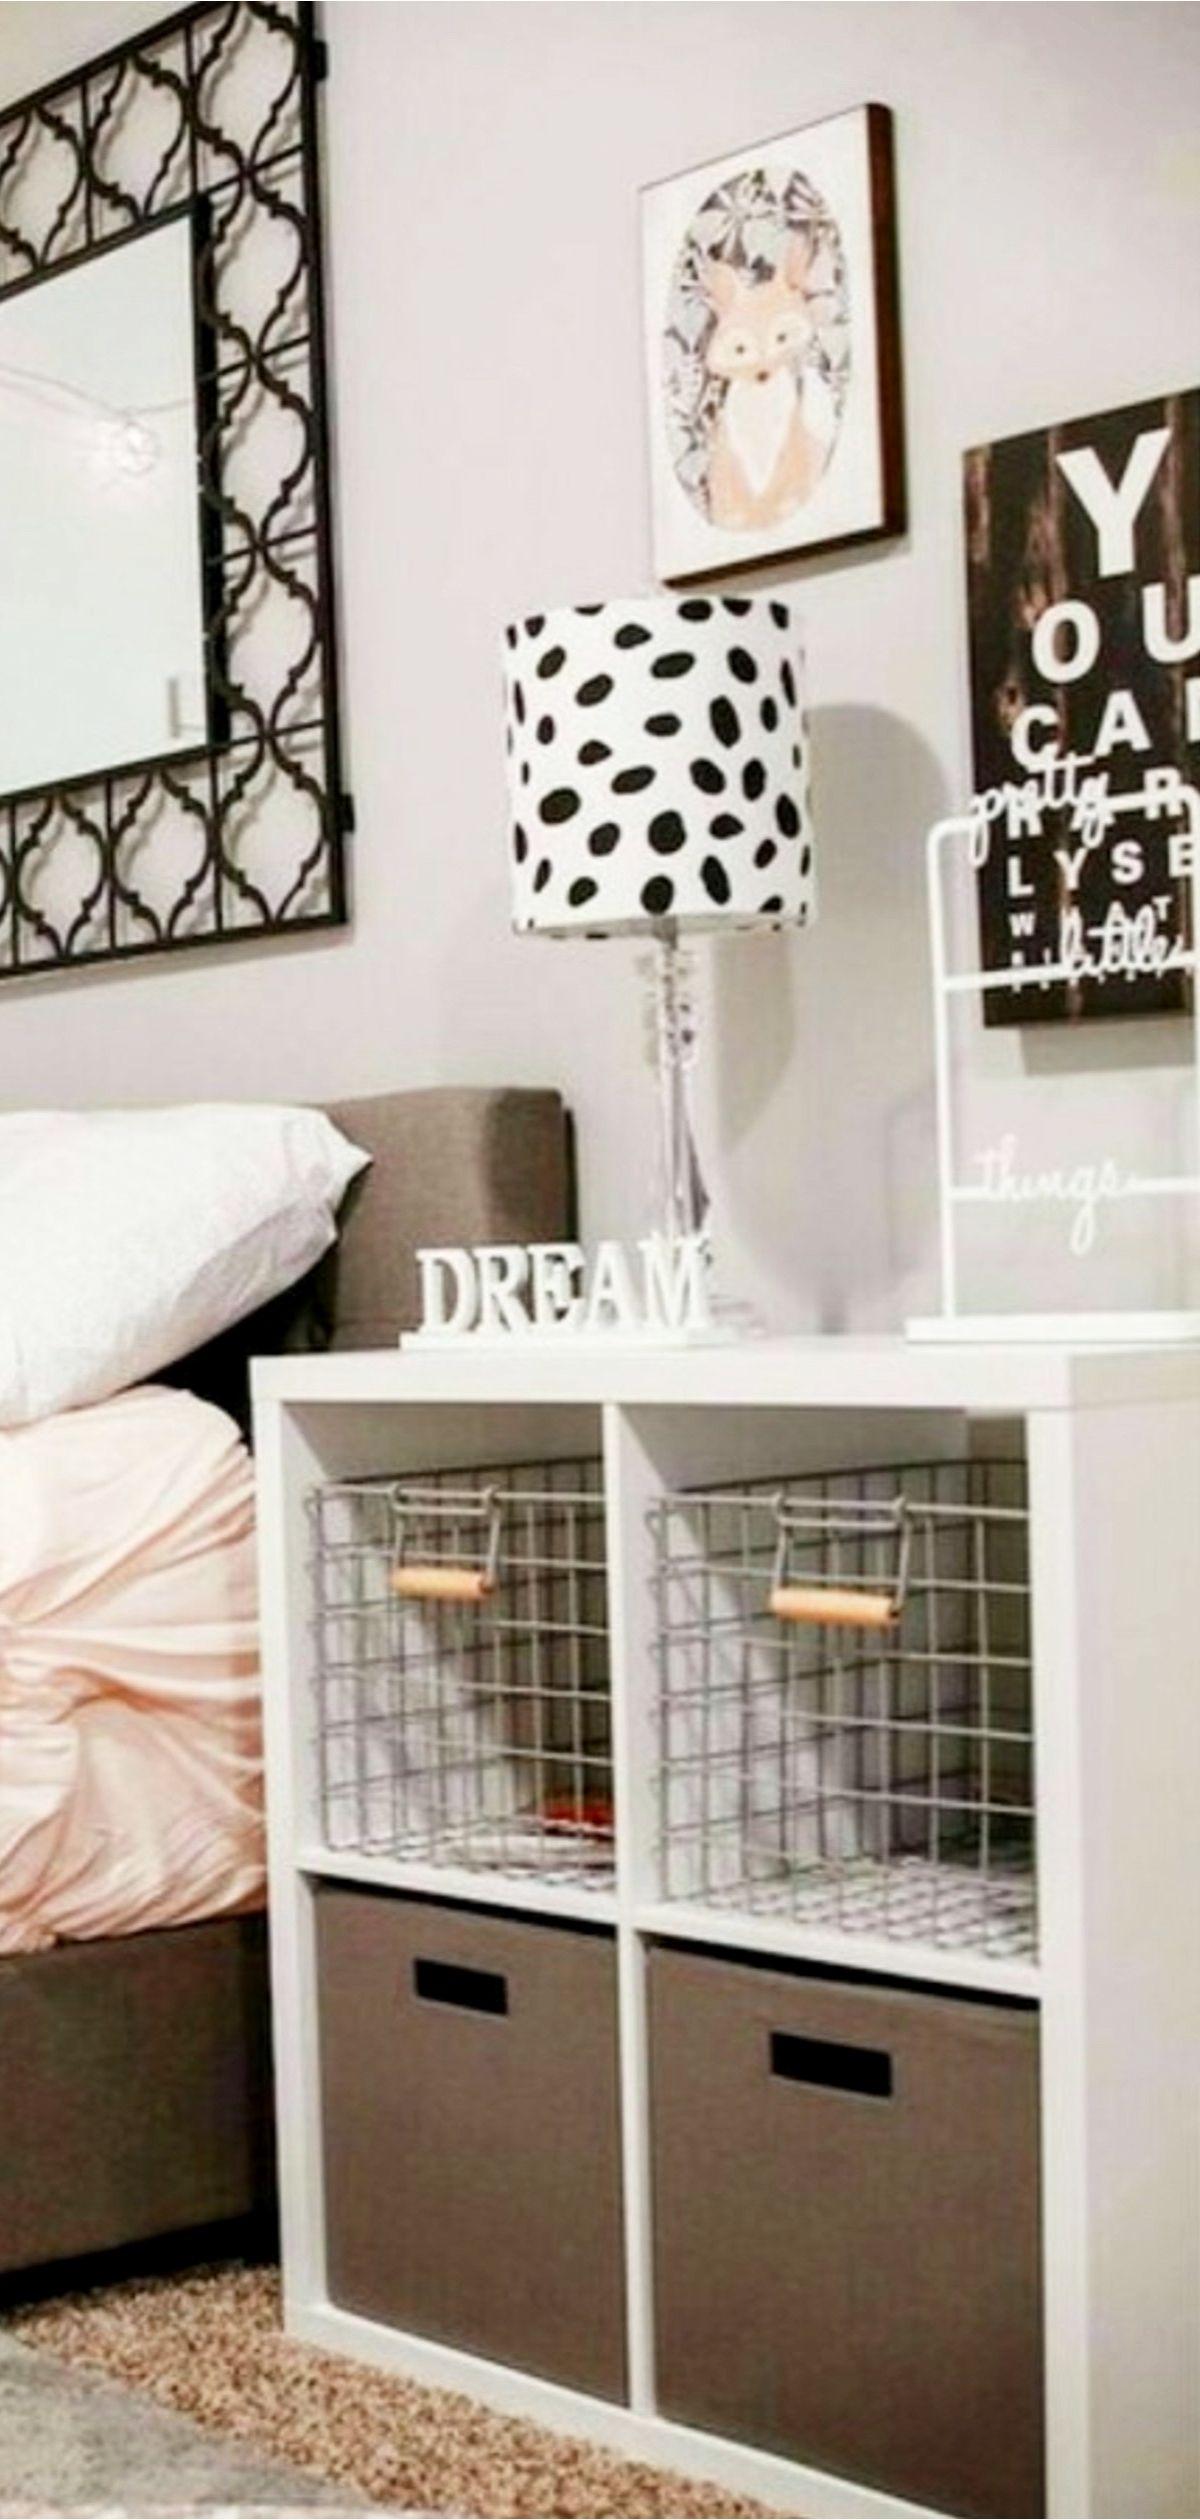 College Dorm Idea for Freshman Year